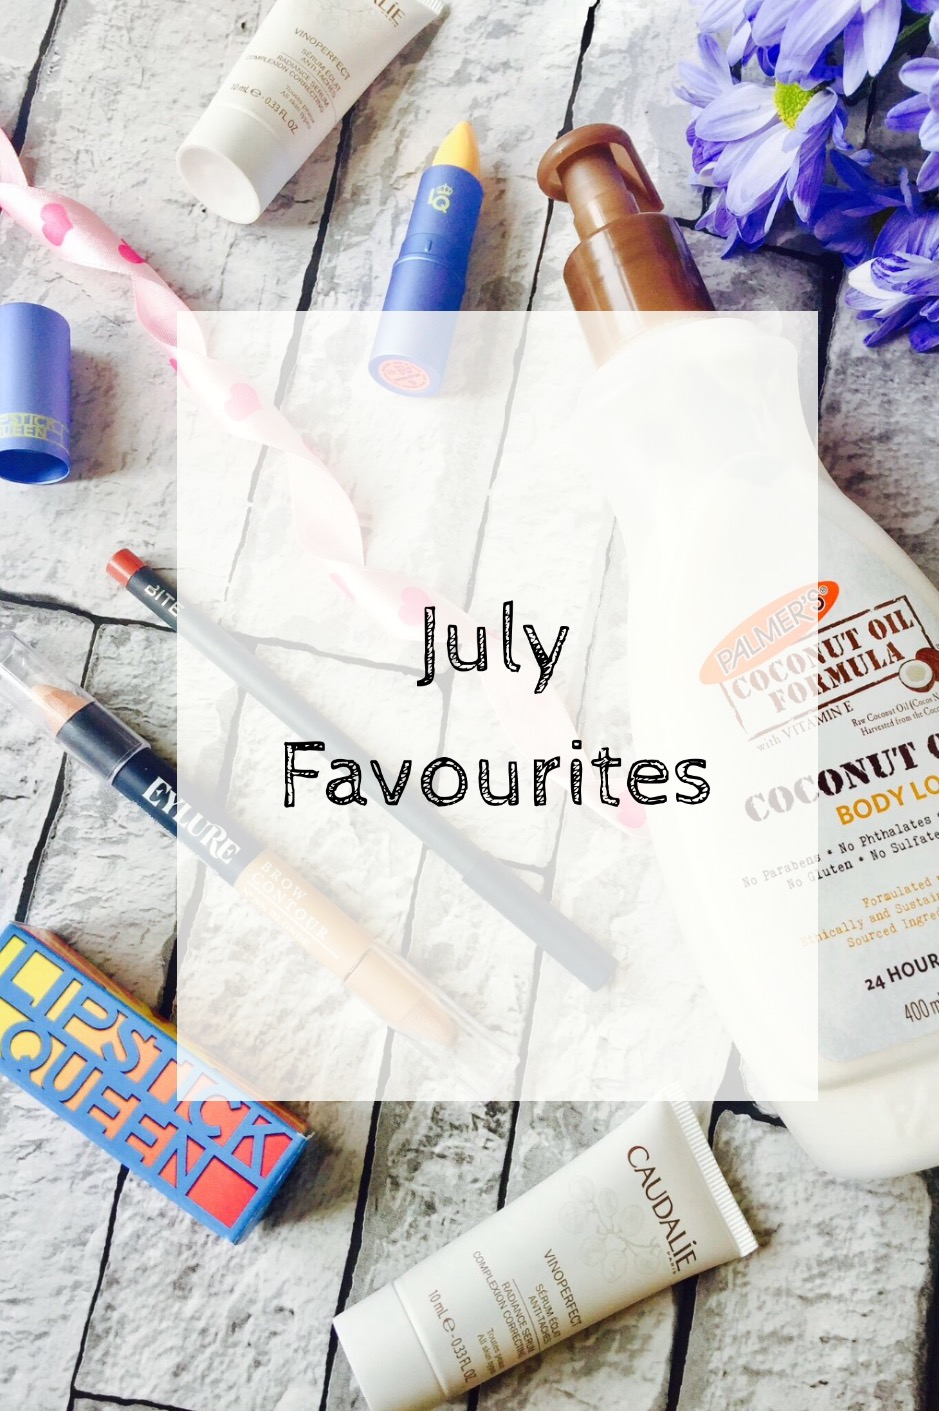 July Favourites 2017 Bite beauty palmers coconut oil Lipstick queen eylure caudalie